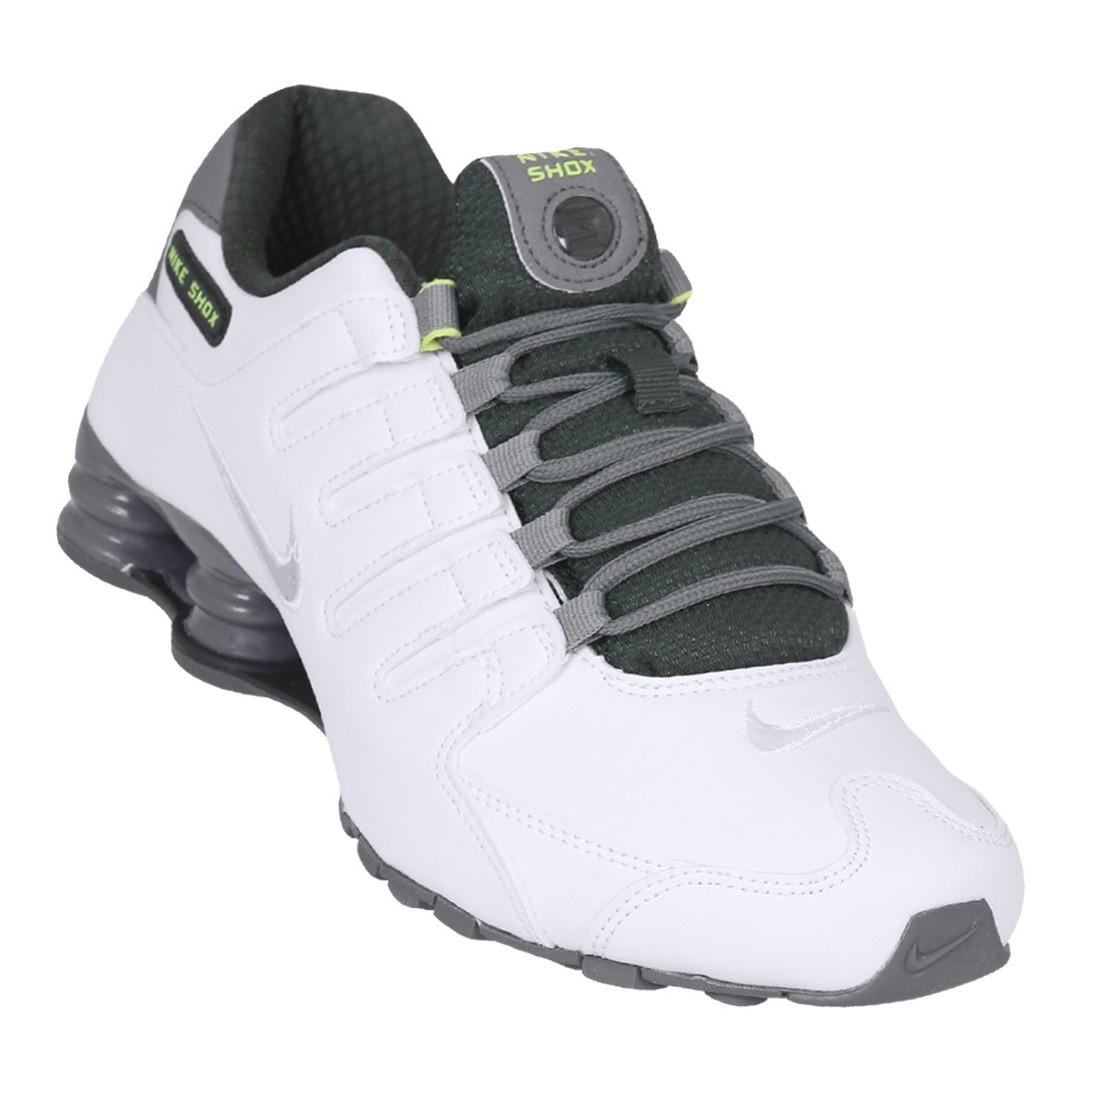 87e1307c95 Tênis Masculino Nike Shox NZ SE 833579-101 - Branco Verde Cinza ...